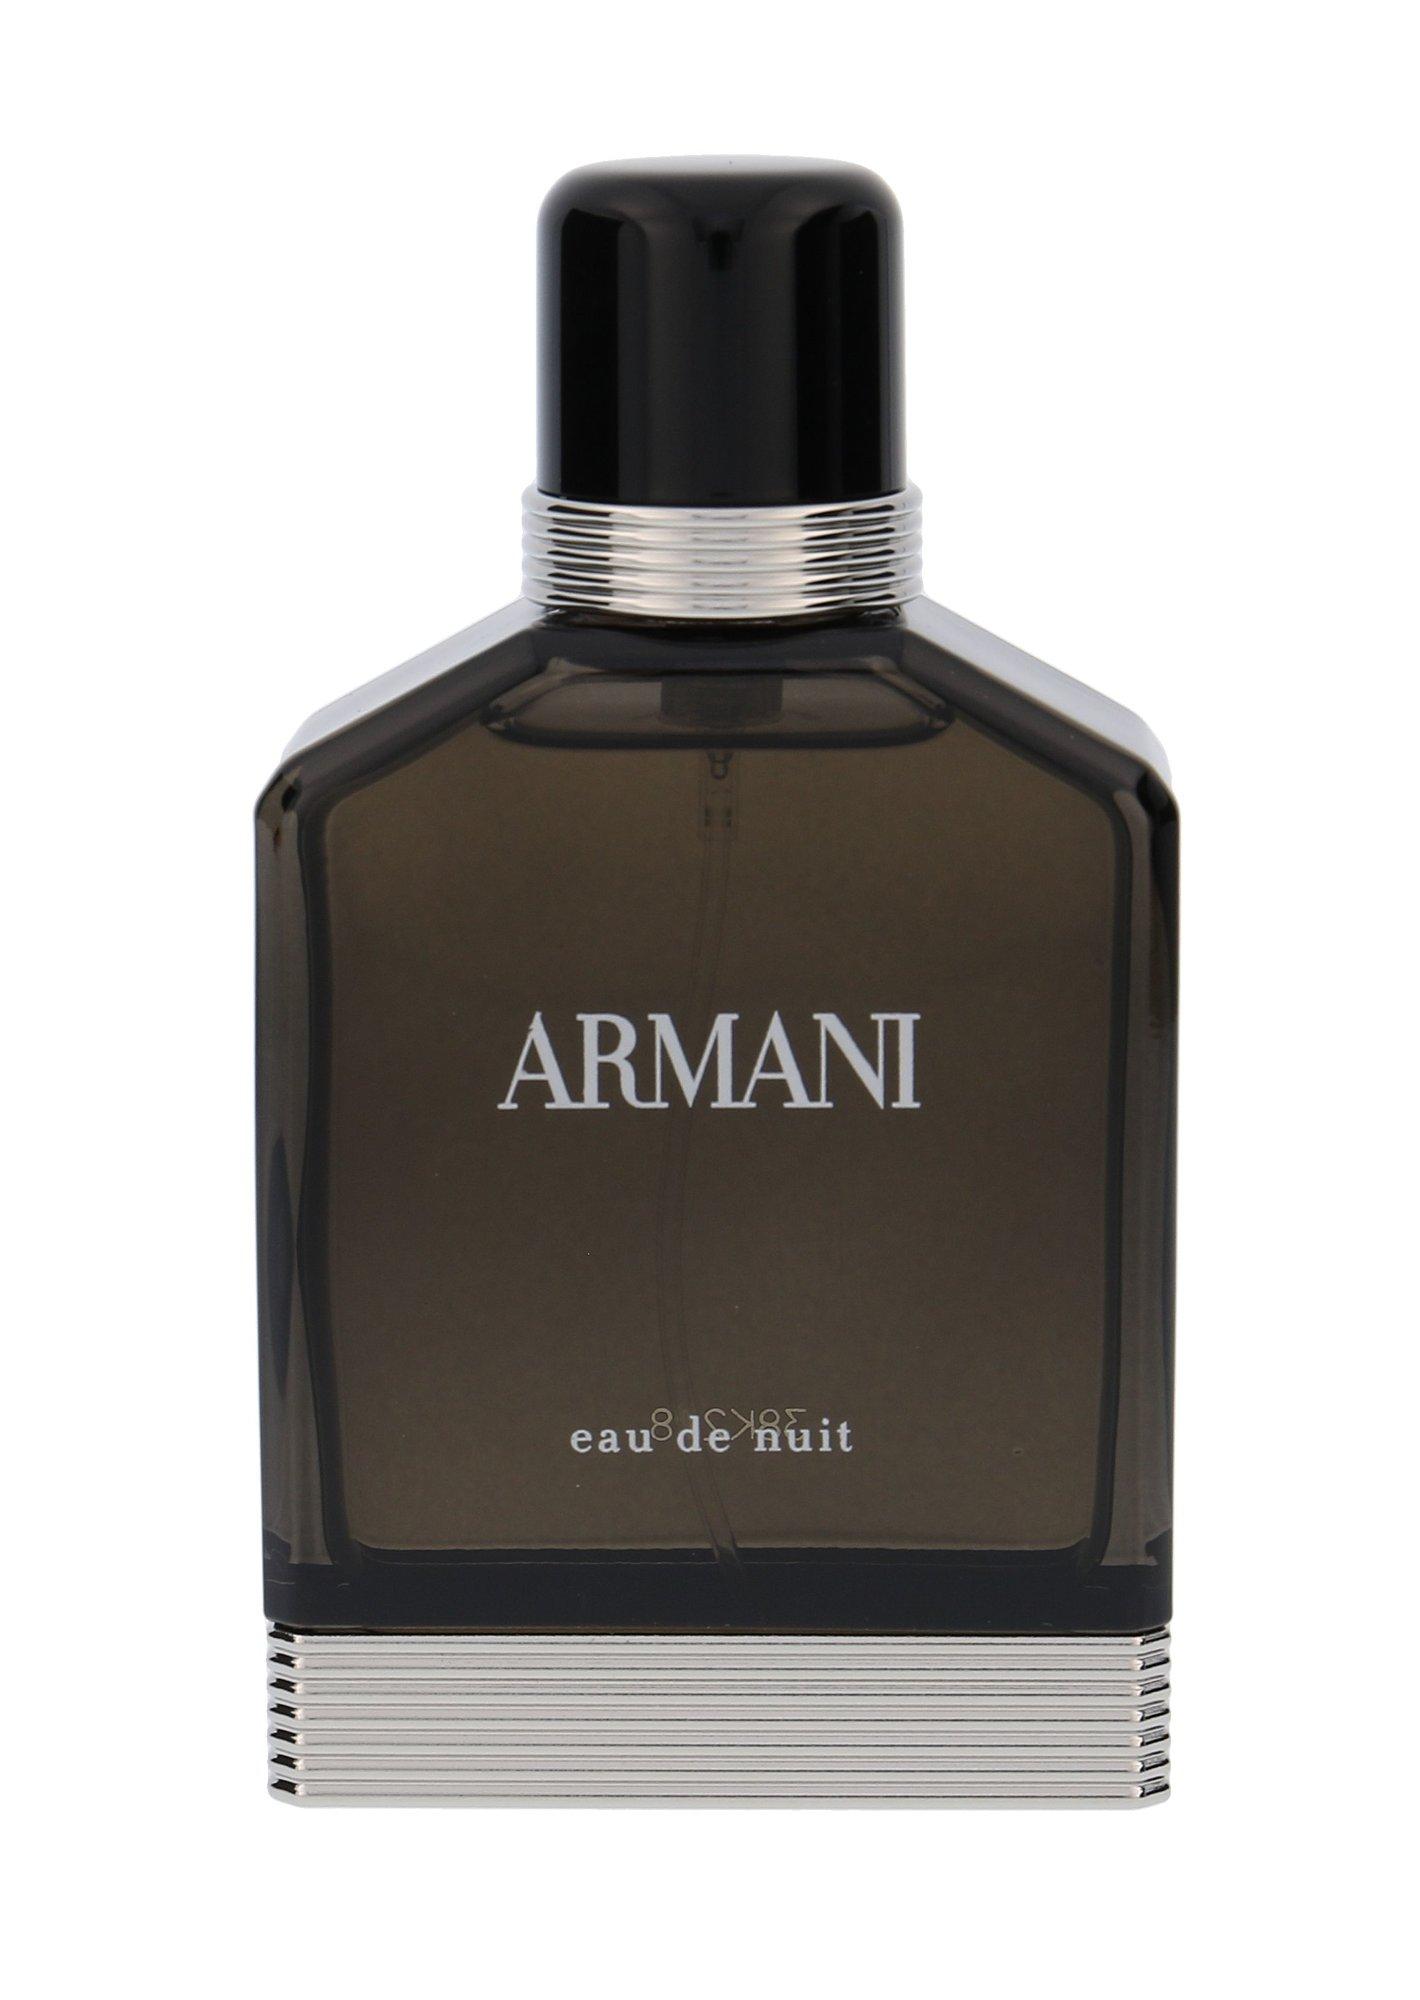 Giorgio Armani Eau de Nuit EDT 50ml